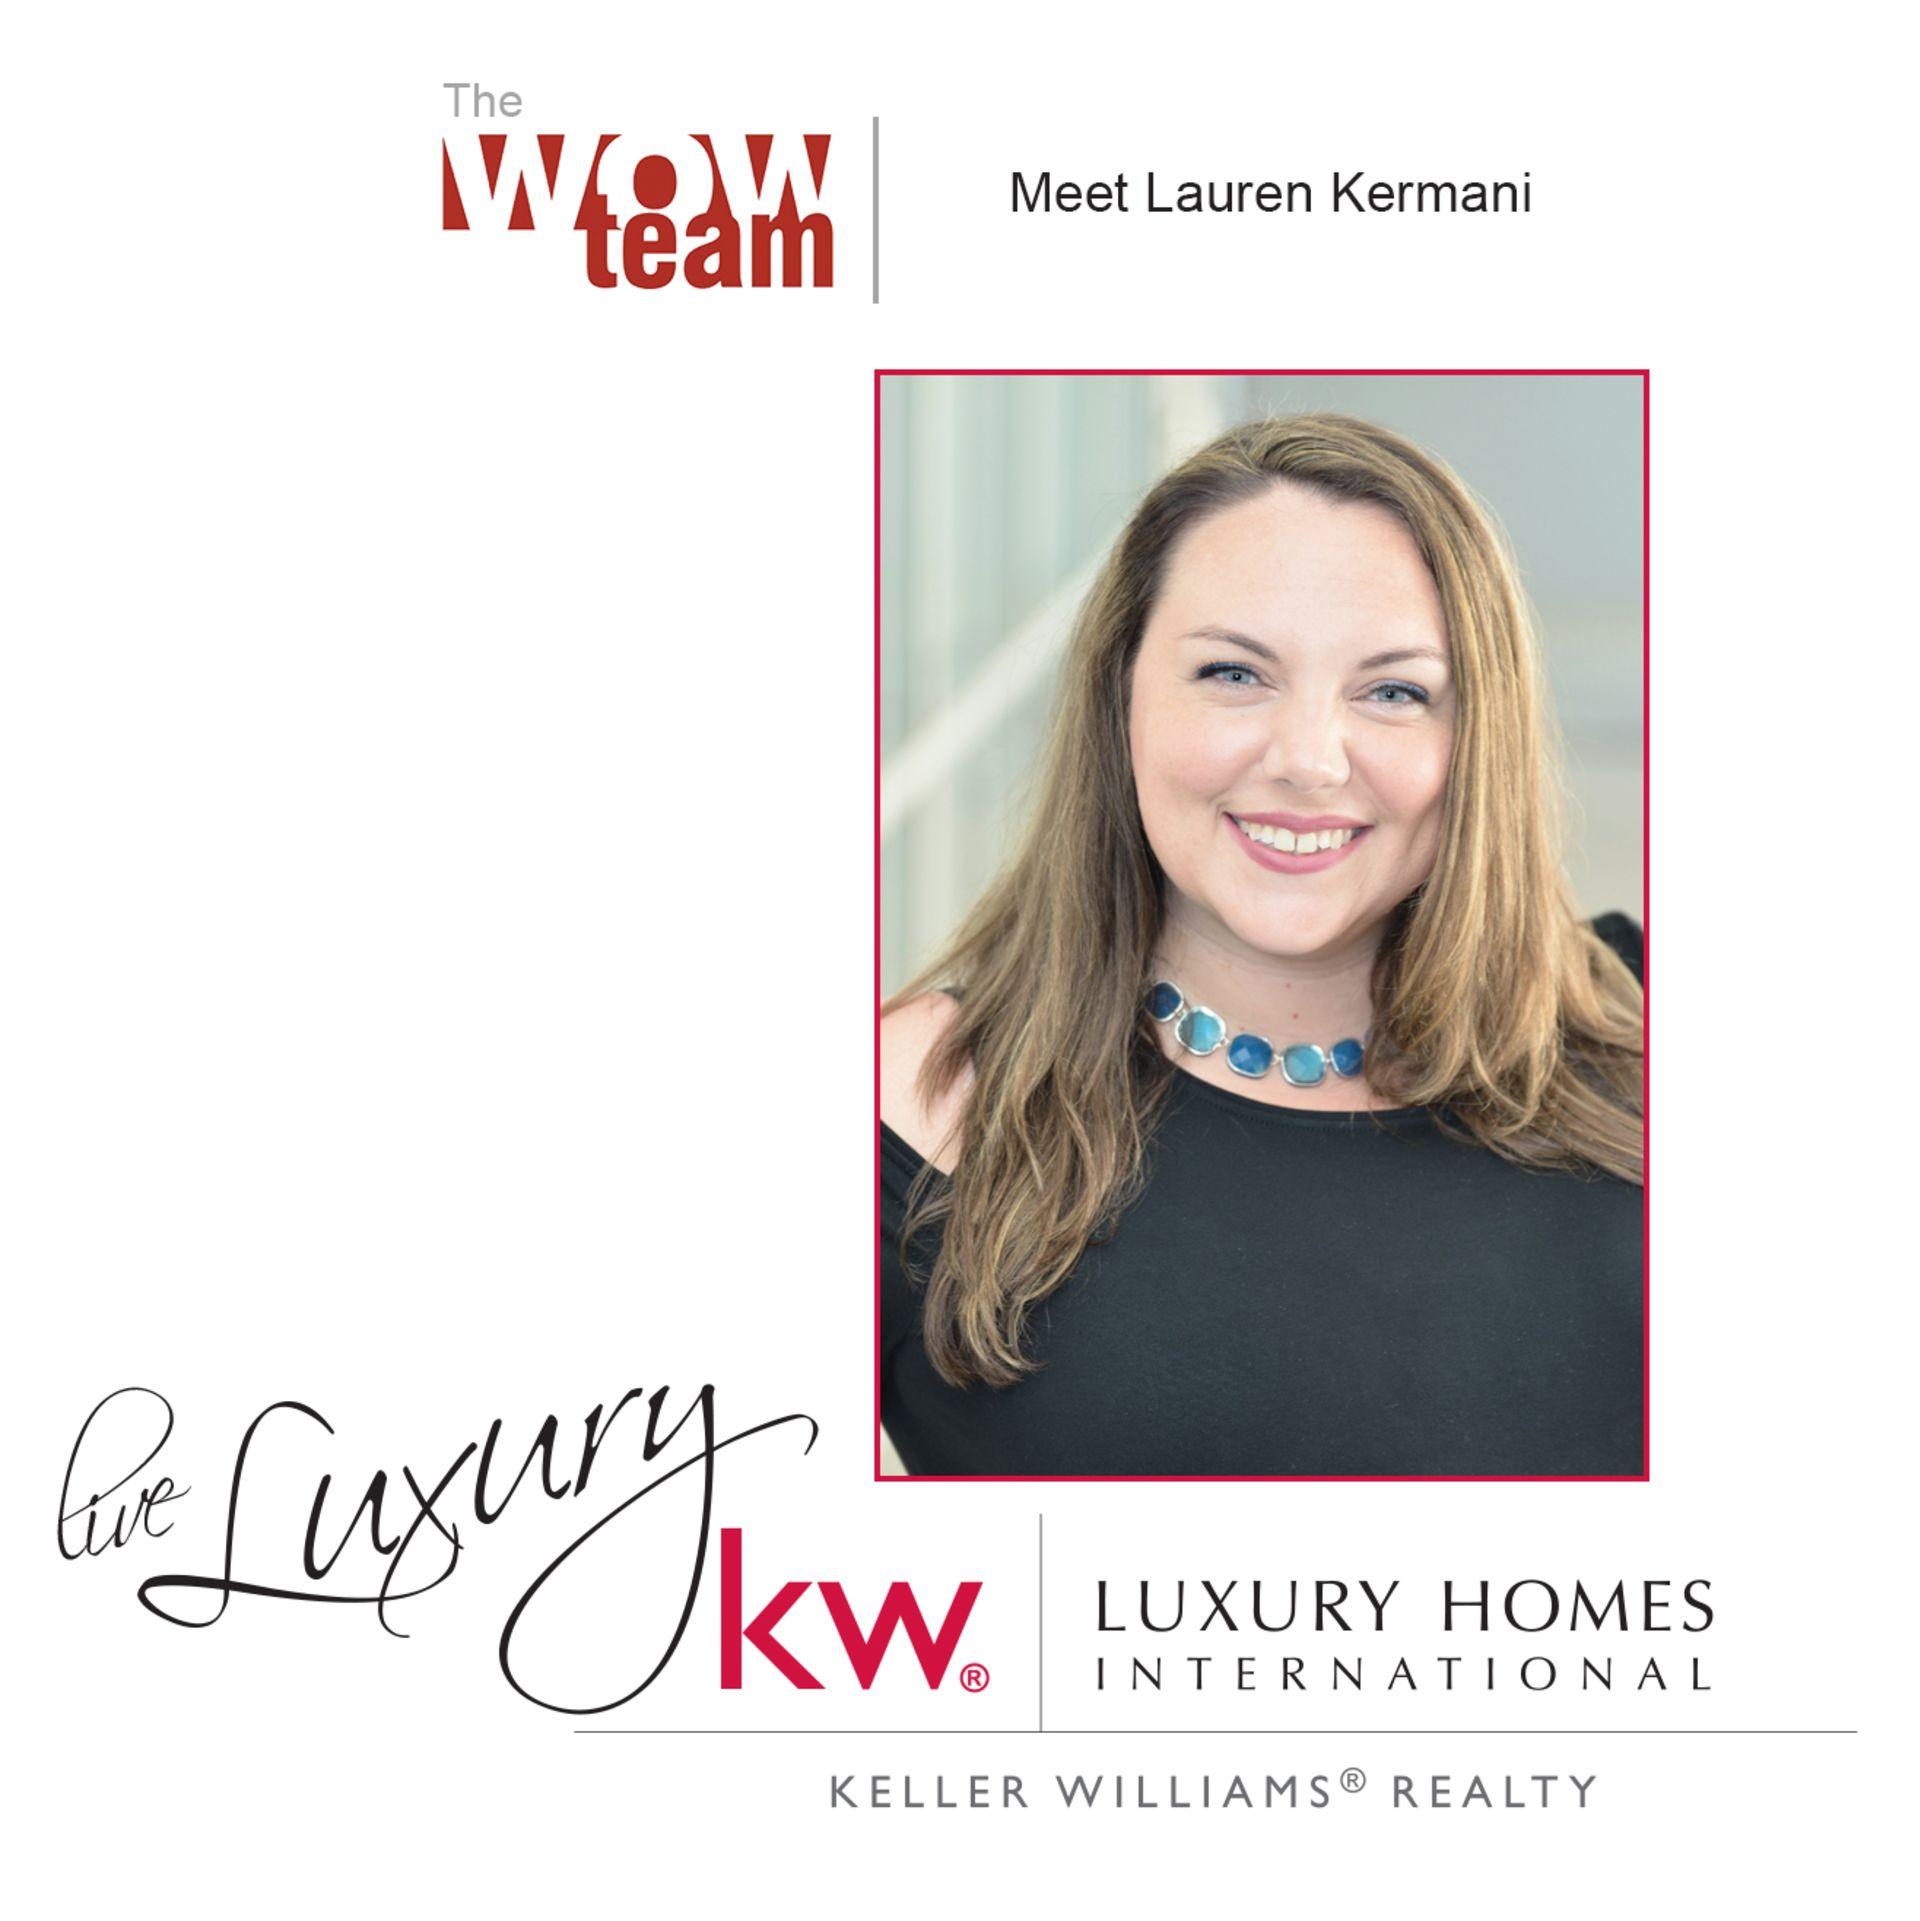 Lauren Kermani – Here We Grow Again